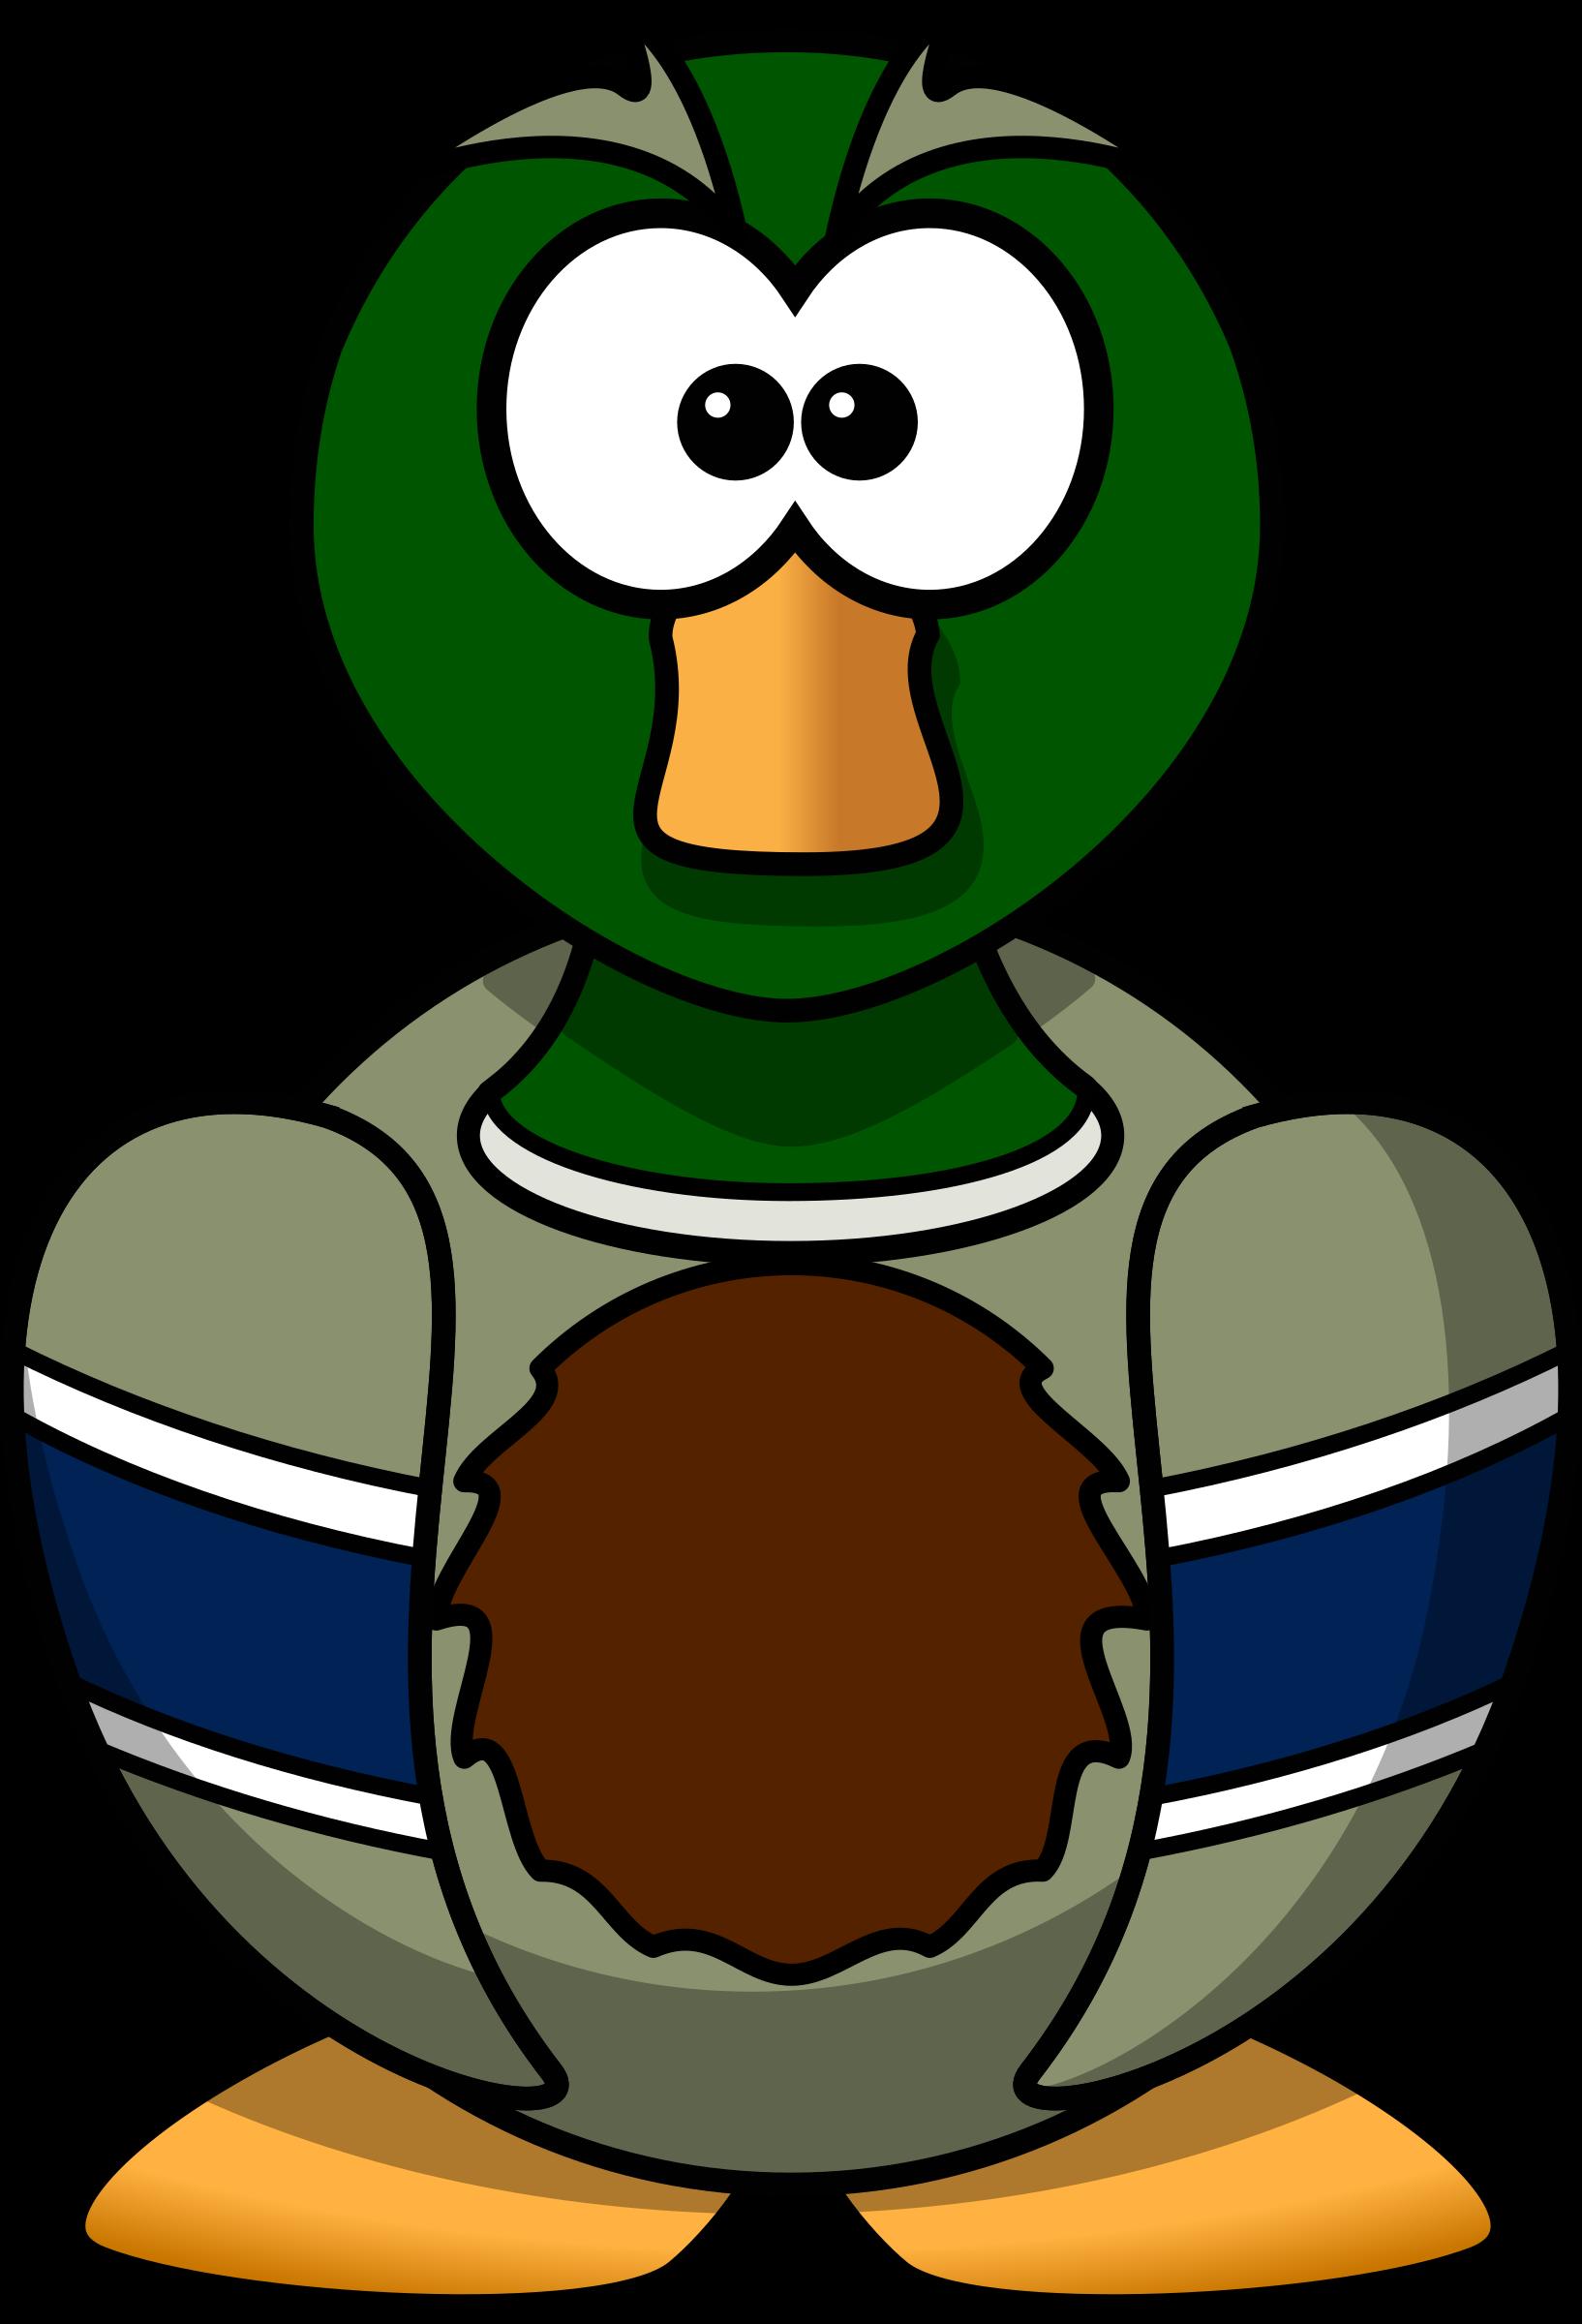 Cartoon Ducks Clipart.